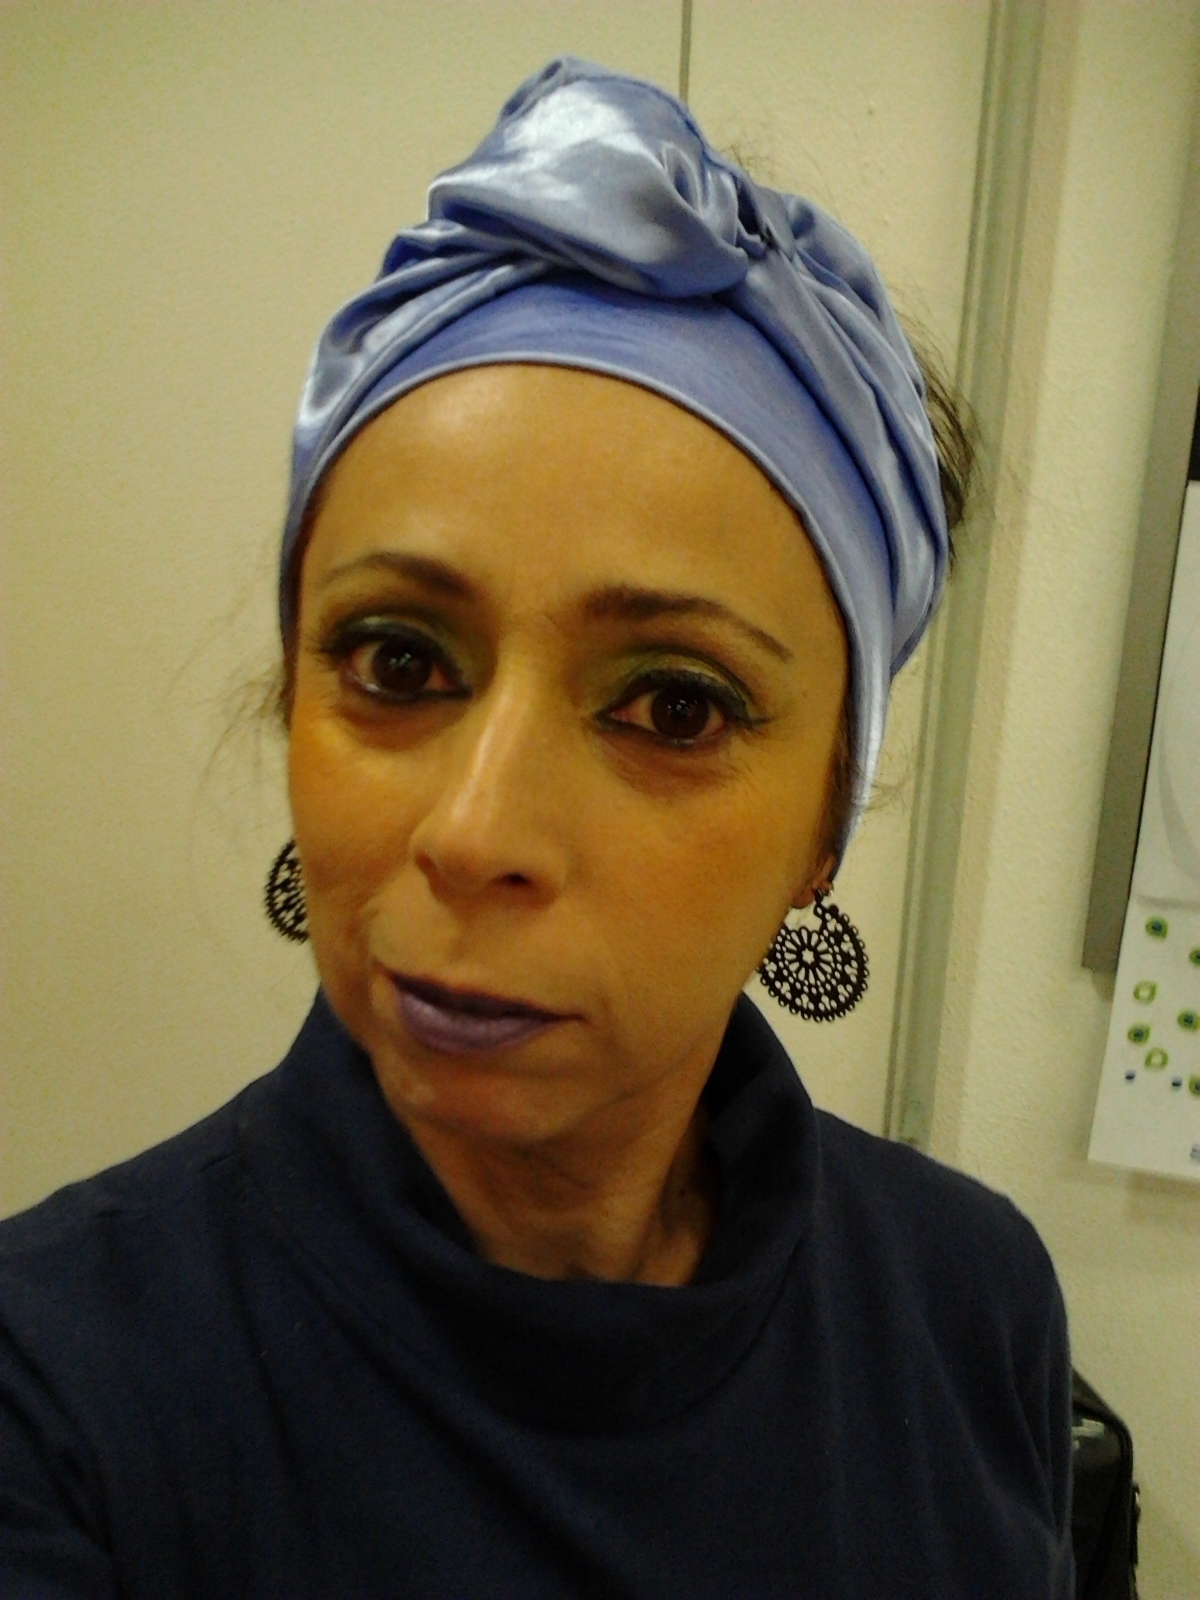 Maquiagem04 maquiador(a) consultor(a) de estetica